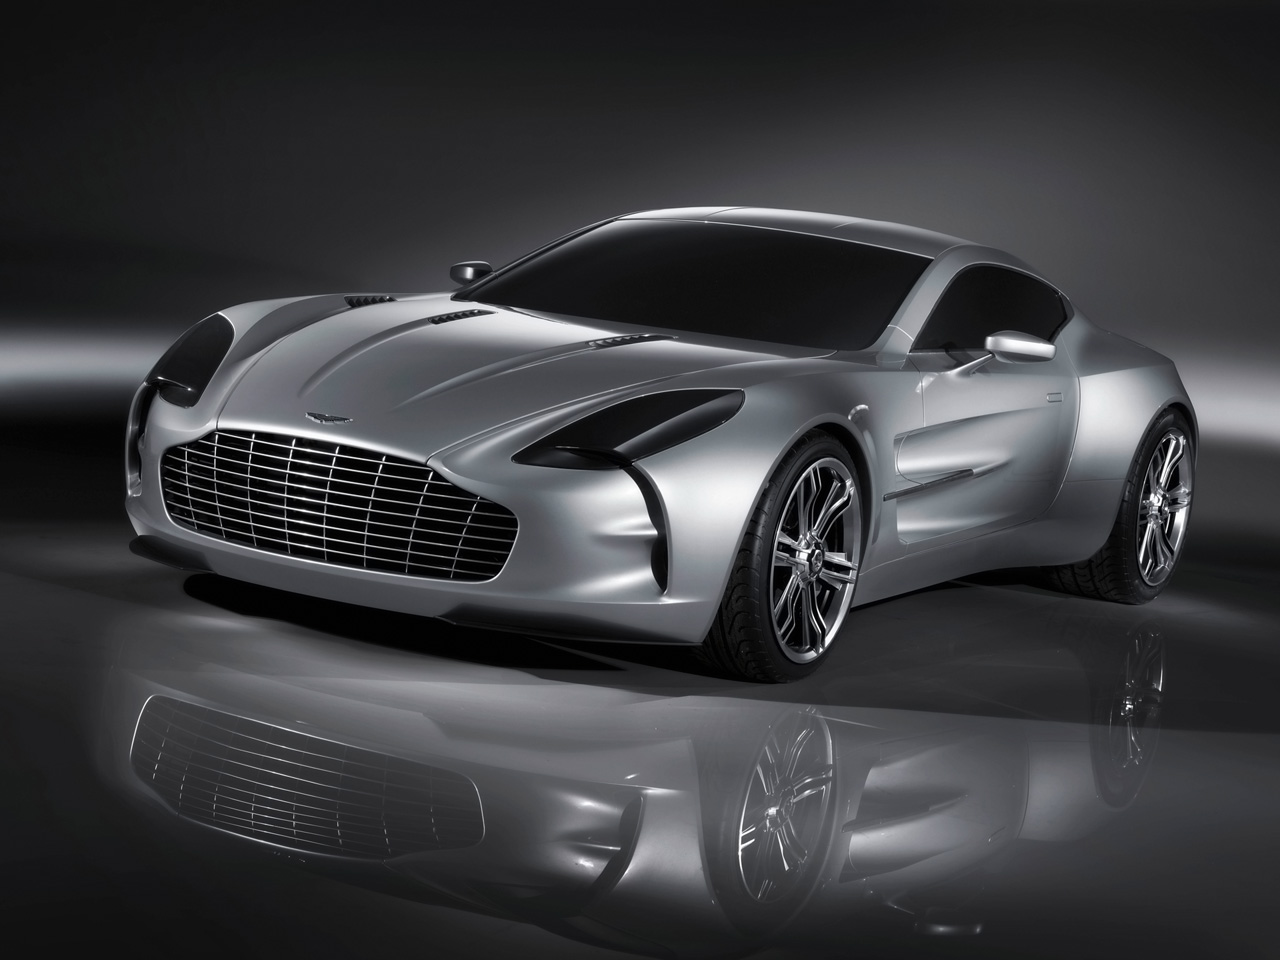 http://3.bp.blogspot.com/-eGHhon9OuMM/TaseWrzDxbI/AAAAAAAAADk/Js3lA9lfROg/s1600/2009-Aston-Martin-One-77-Front-Angle-Tilt-1280x960%2B%2525281%252529.jpg